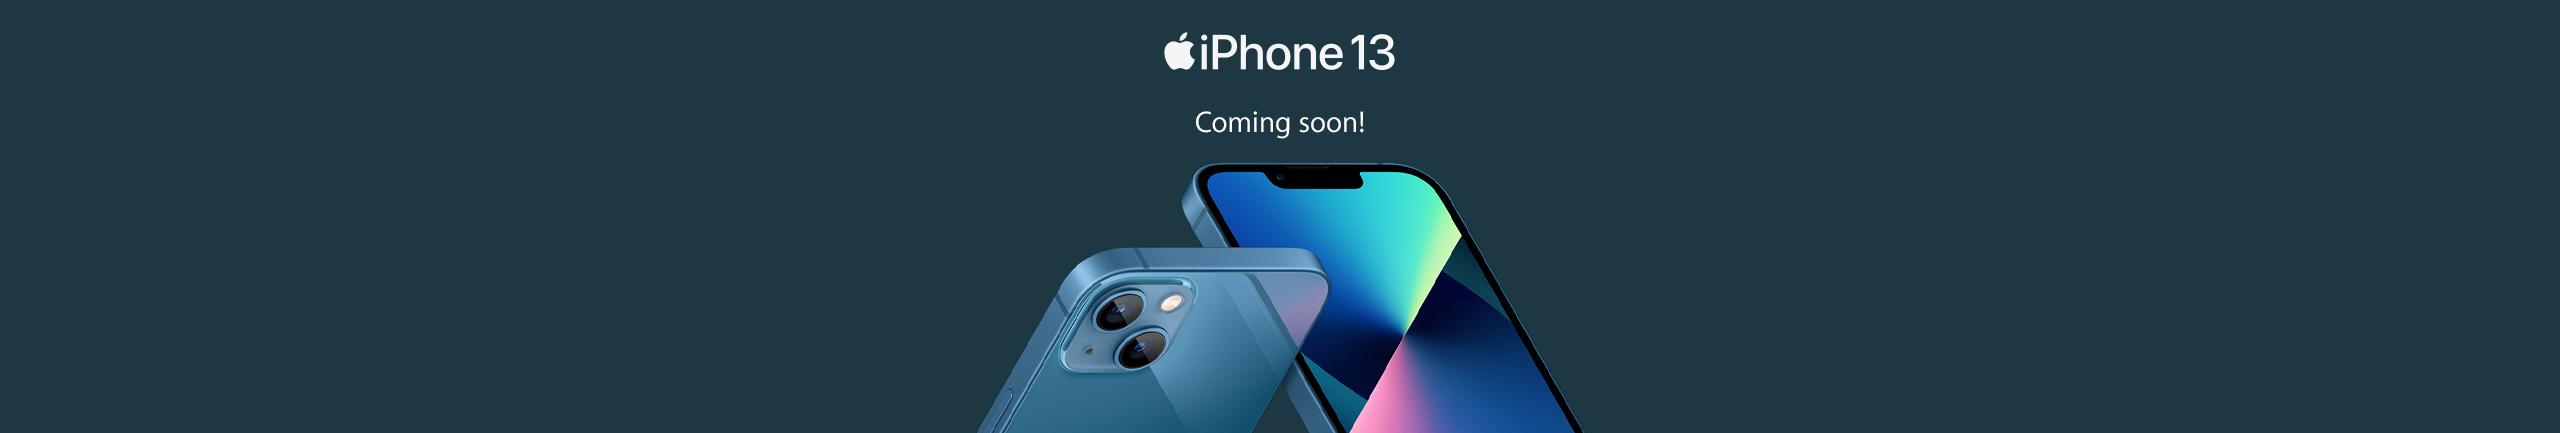 NPL Apple iPhone 13 coming soon